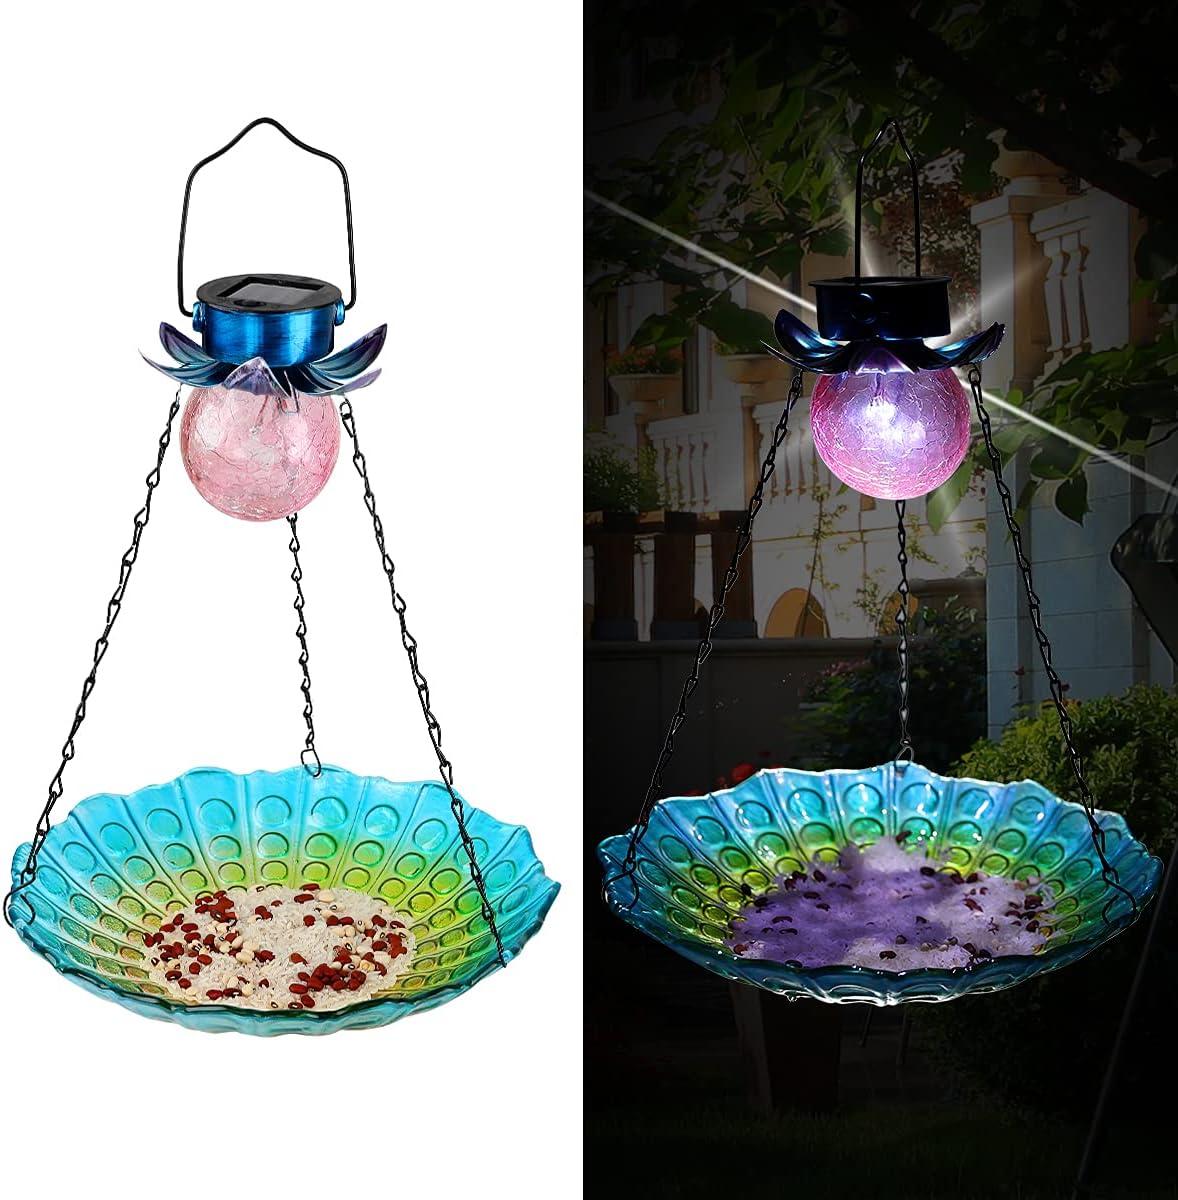 Aismio Solar Bird Feeder,Solar Powered Garden Lantern Light Bird-House Wild Hanging Birdfeeder,for Attracting Birds Decorative Solar Garden Crackle Glass Ball Light for Yard Lawn,11.3 Inch Dia